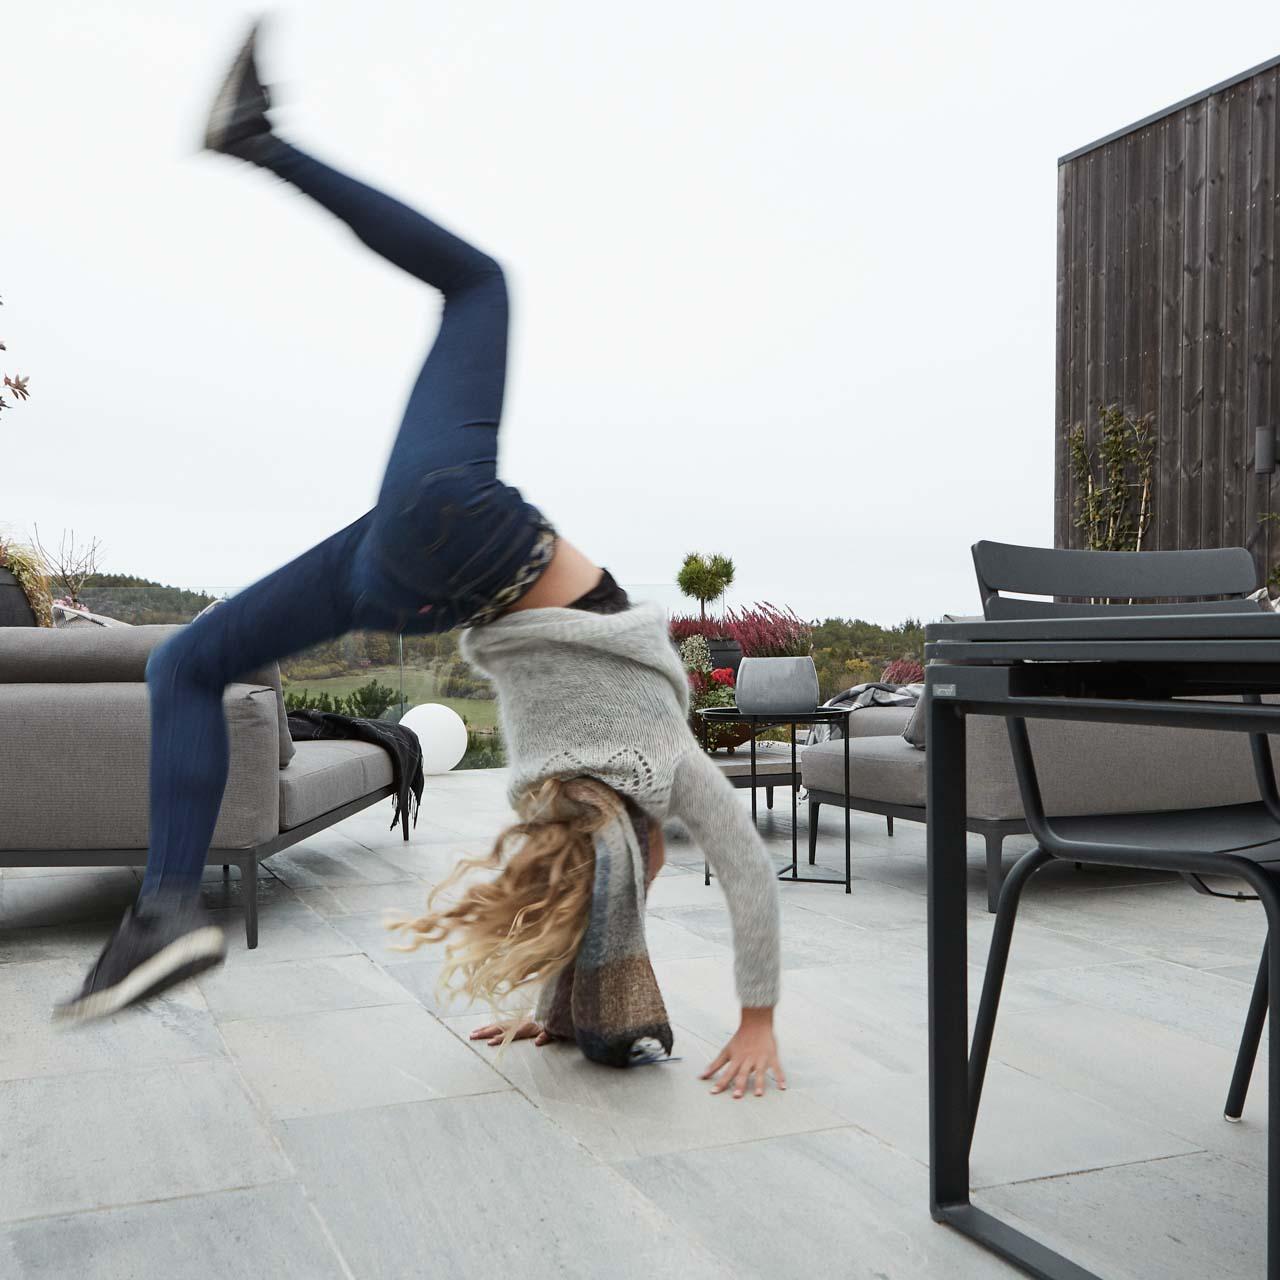 En ung jente slår hjul på en stor terrasse belagt med utefliser i antikkbørstet lys Oppdalskifer